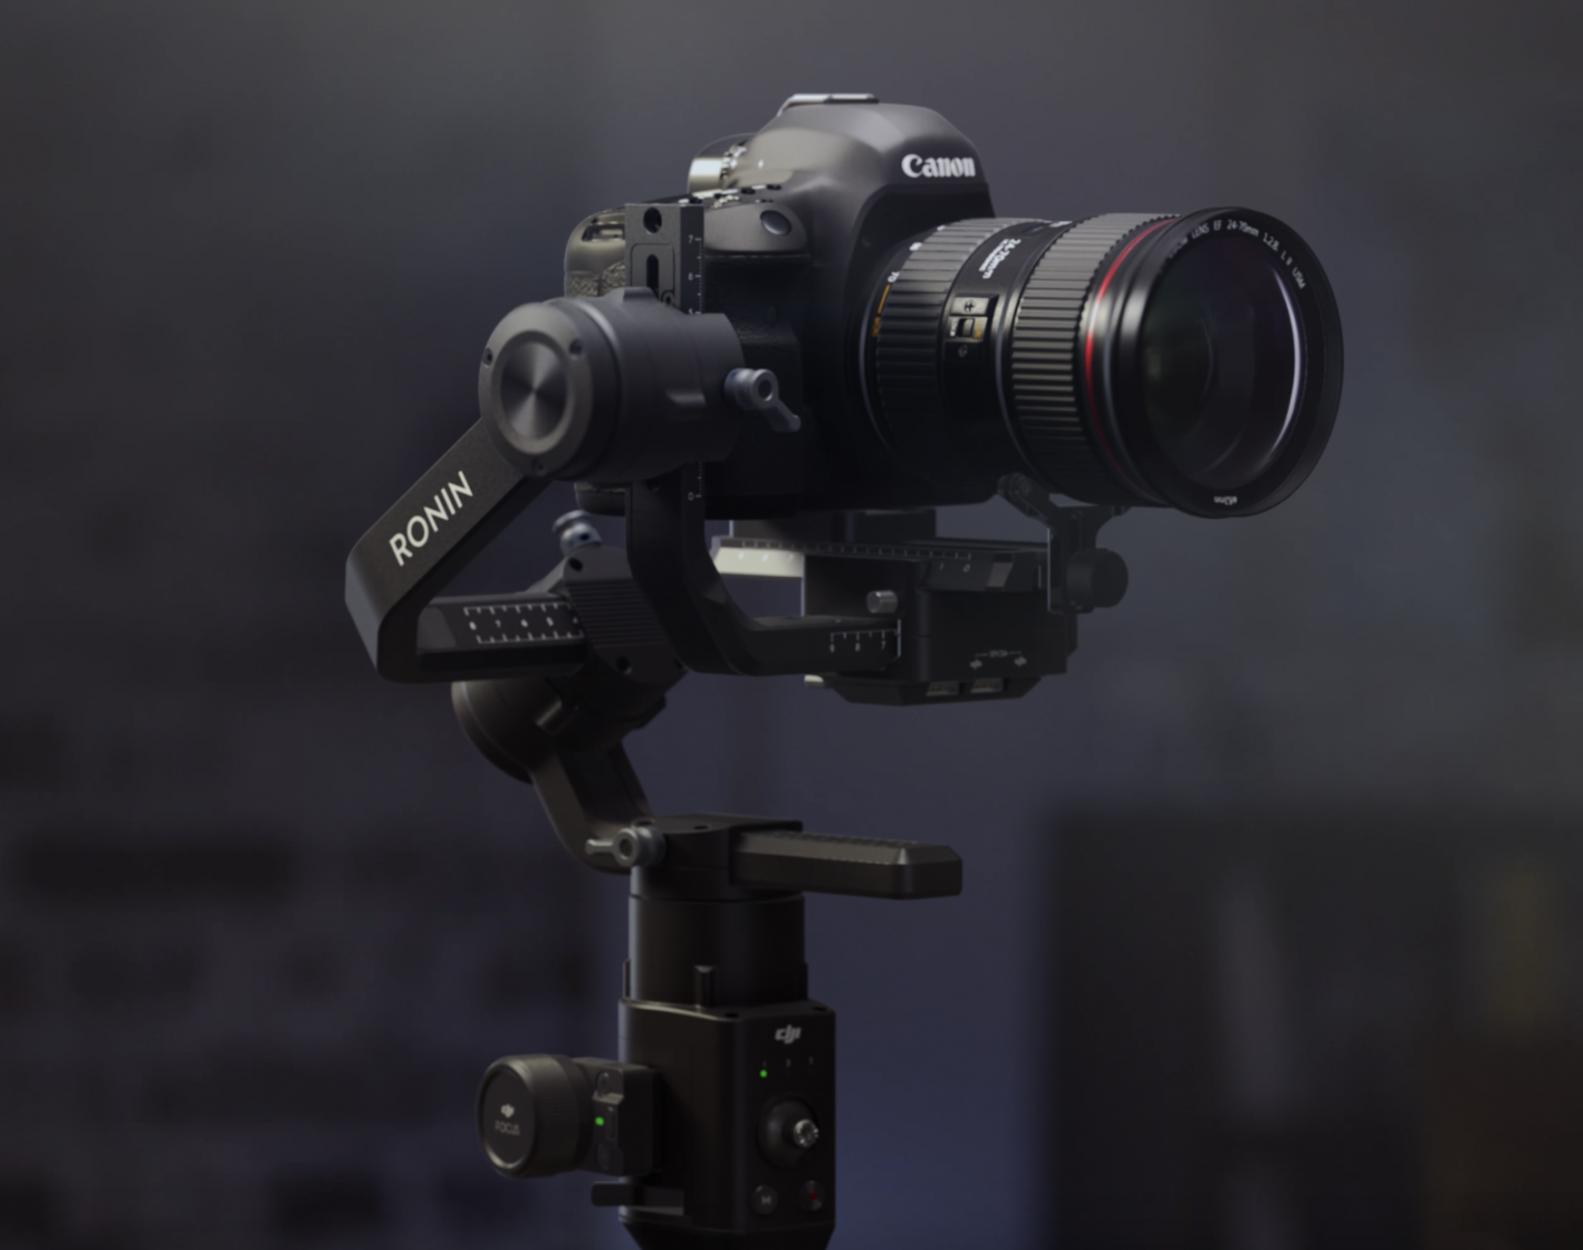 DJI Ronin-S: Camera Stabilizer